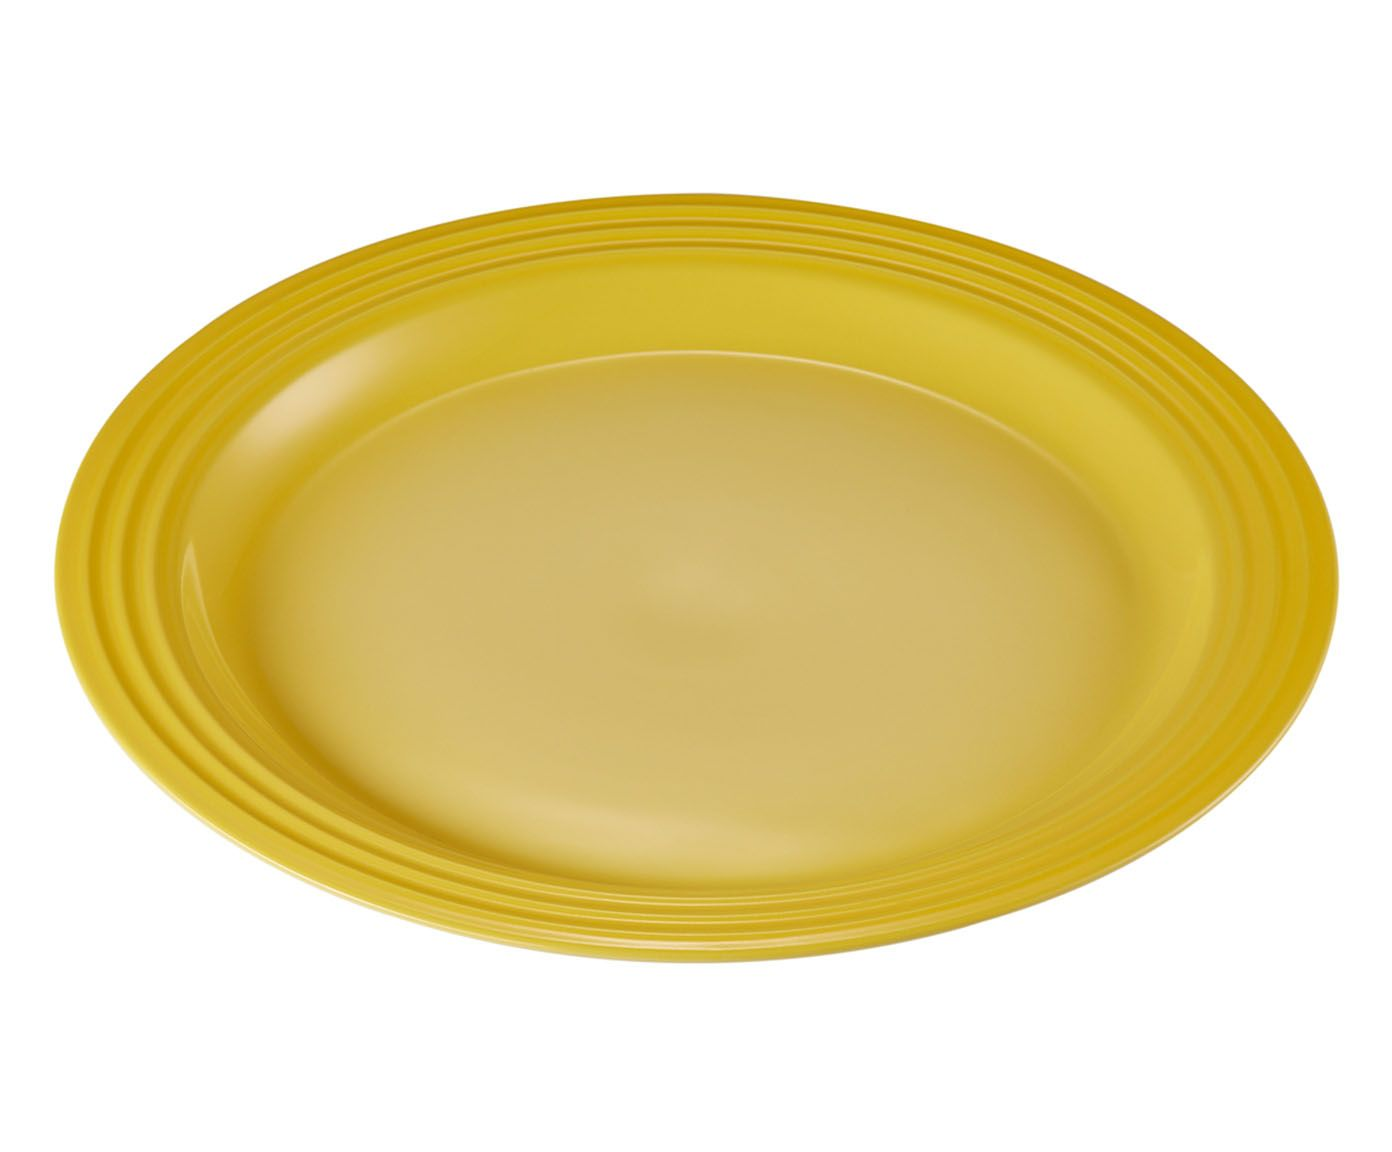 Prato Raso Amarelo Soleil - 27cm   Westwing.com.br